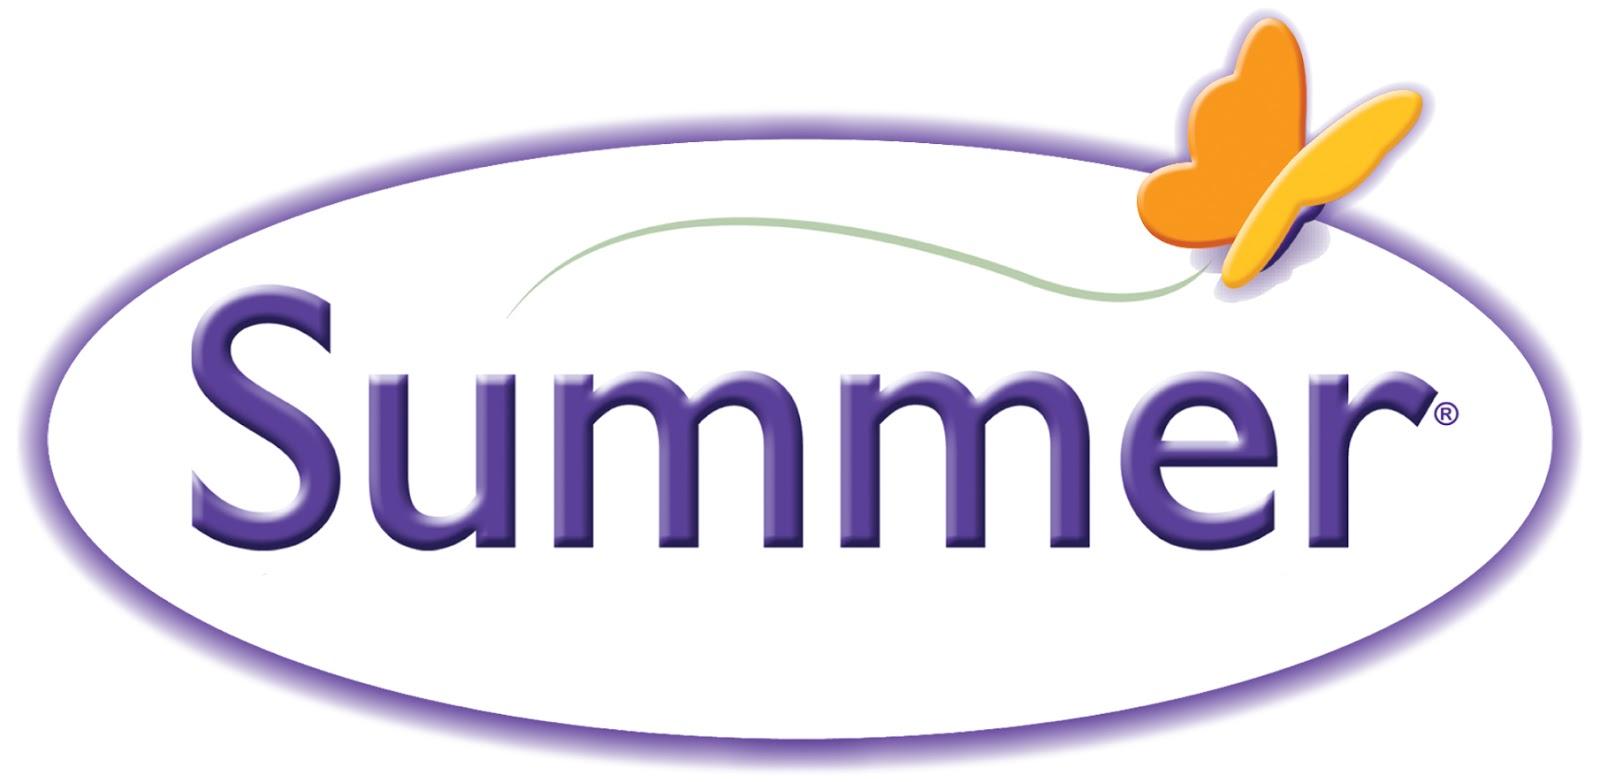 Znalezione obrazy dla zapytania summer logo